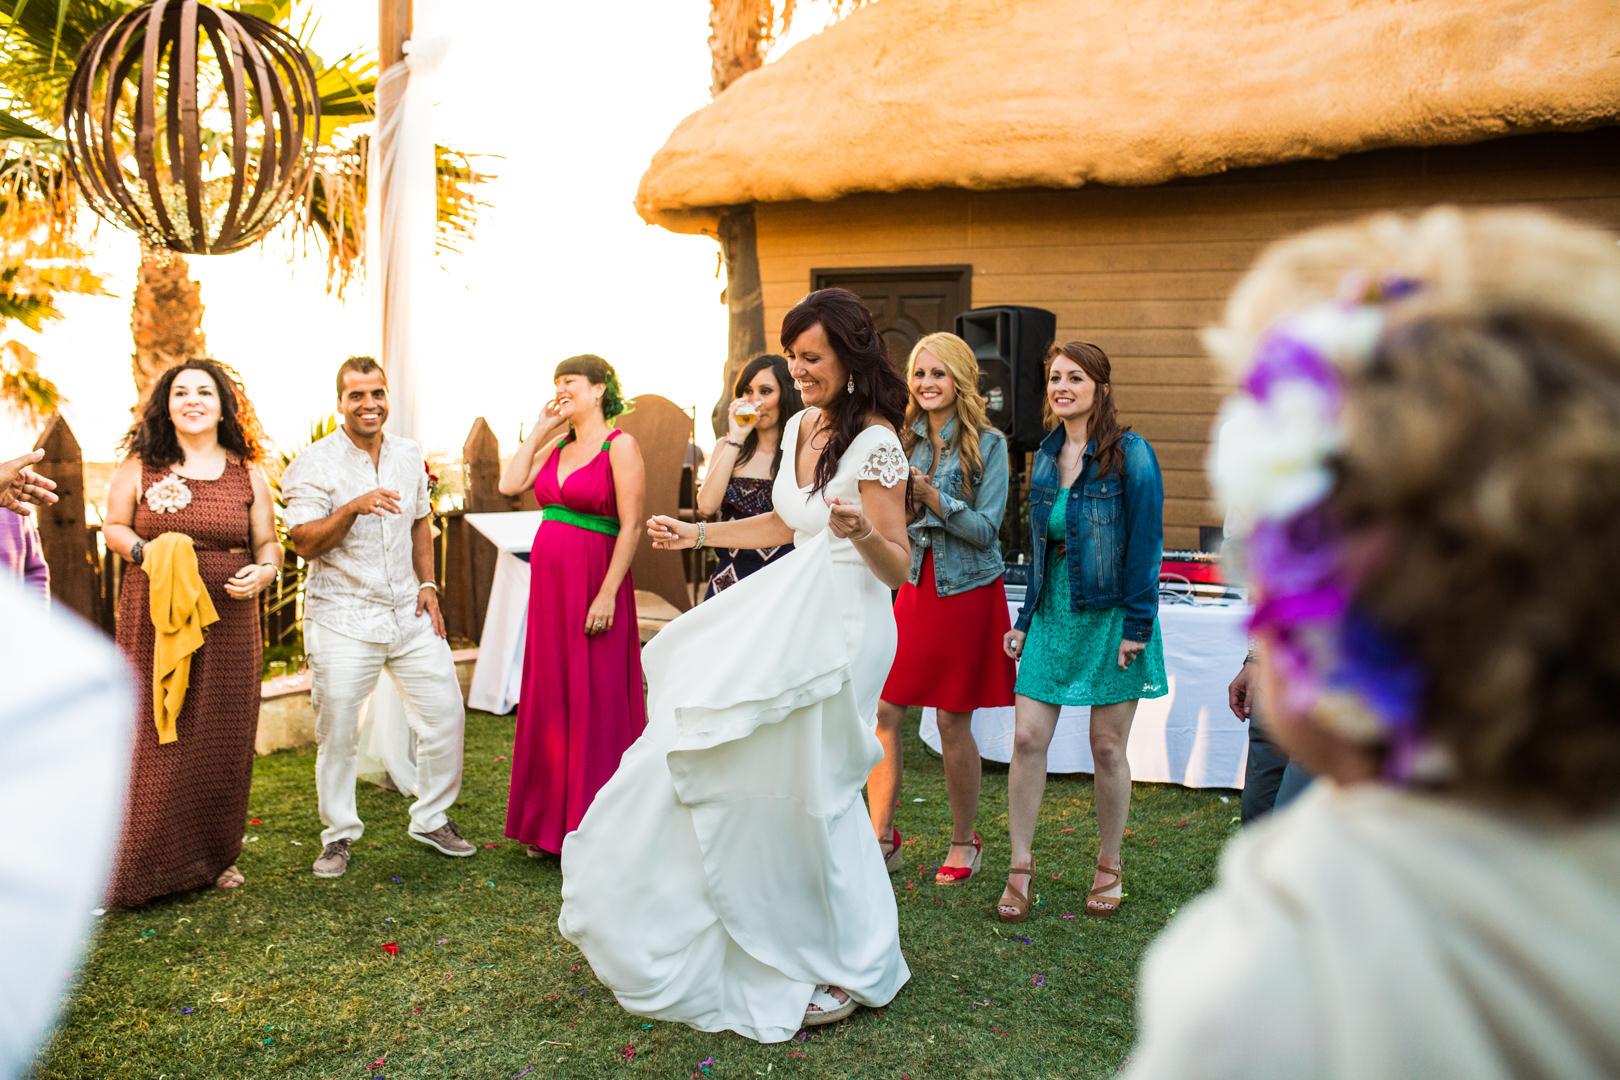 Boda-Sajorami-Beach-Cadiz-Zahora-Pedro-Gema-engagement-Rafael-Torres-fotografo-bodas-sevilla-madrid-barcelona-wedding-photographer--42.jpg